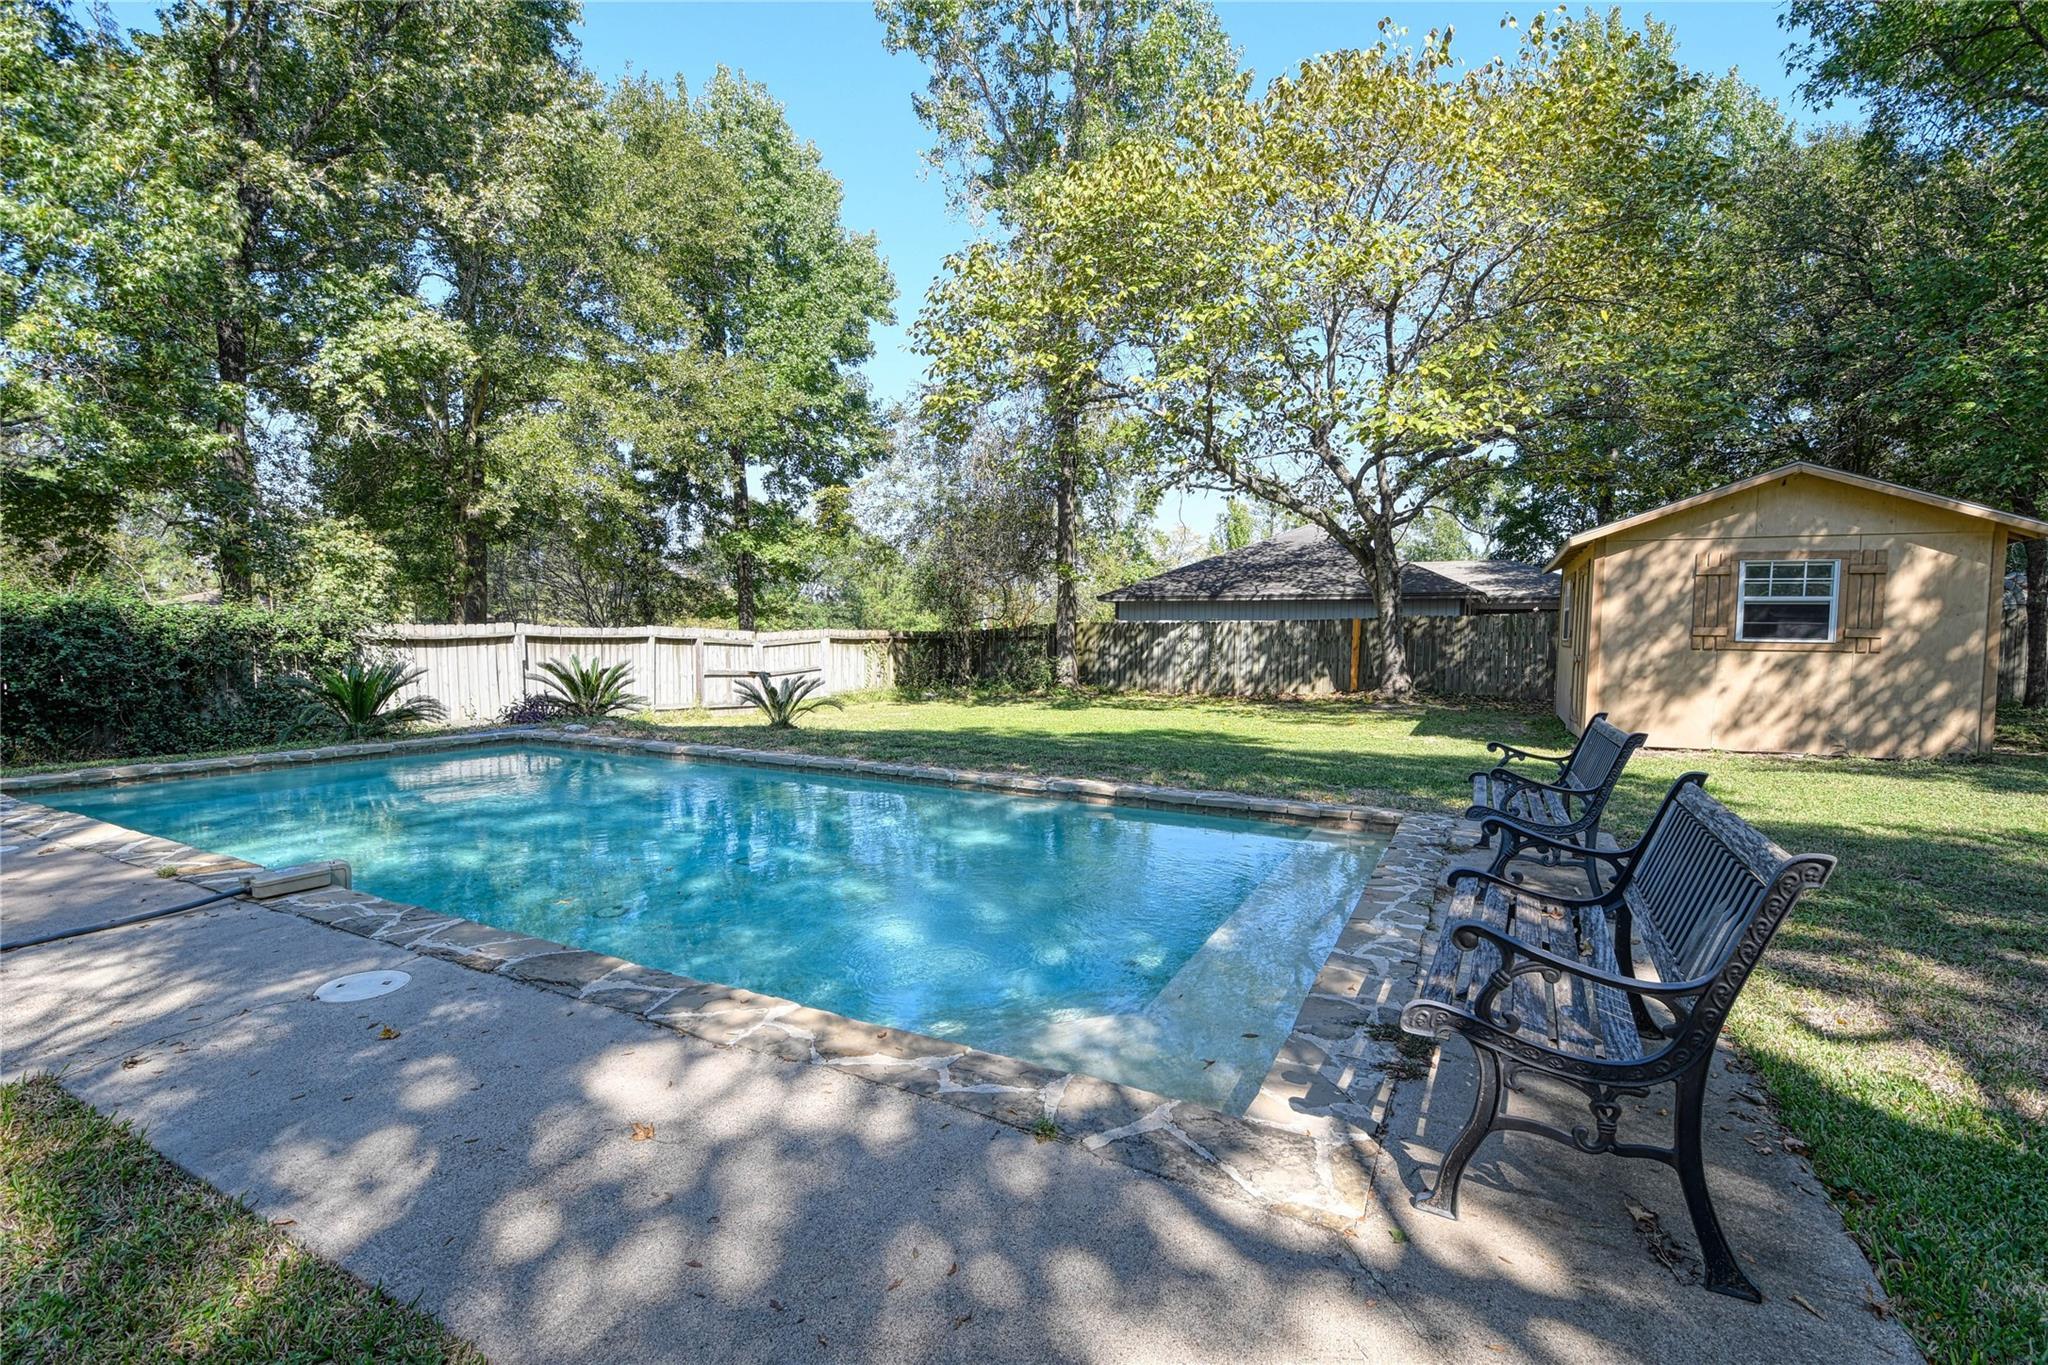 9853 fm 149 Property Photo - Montgomery, TX real estate listing